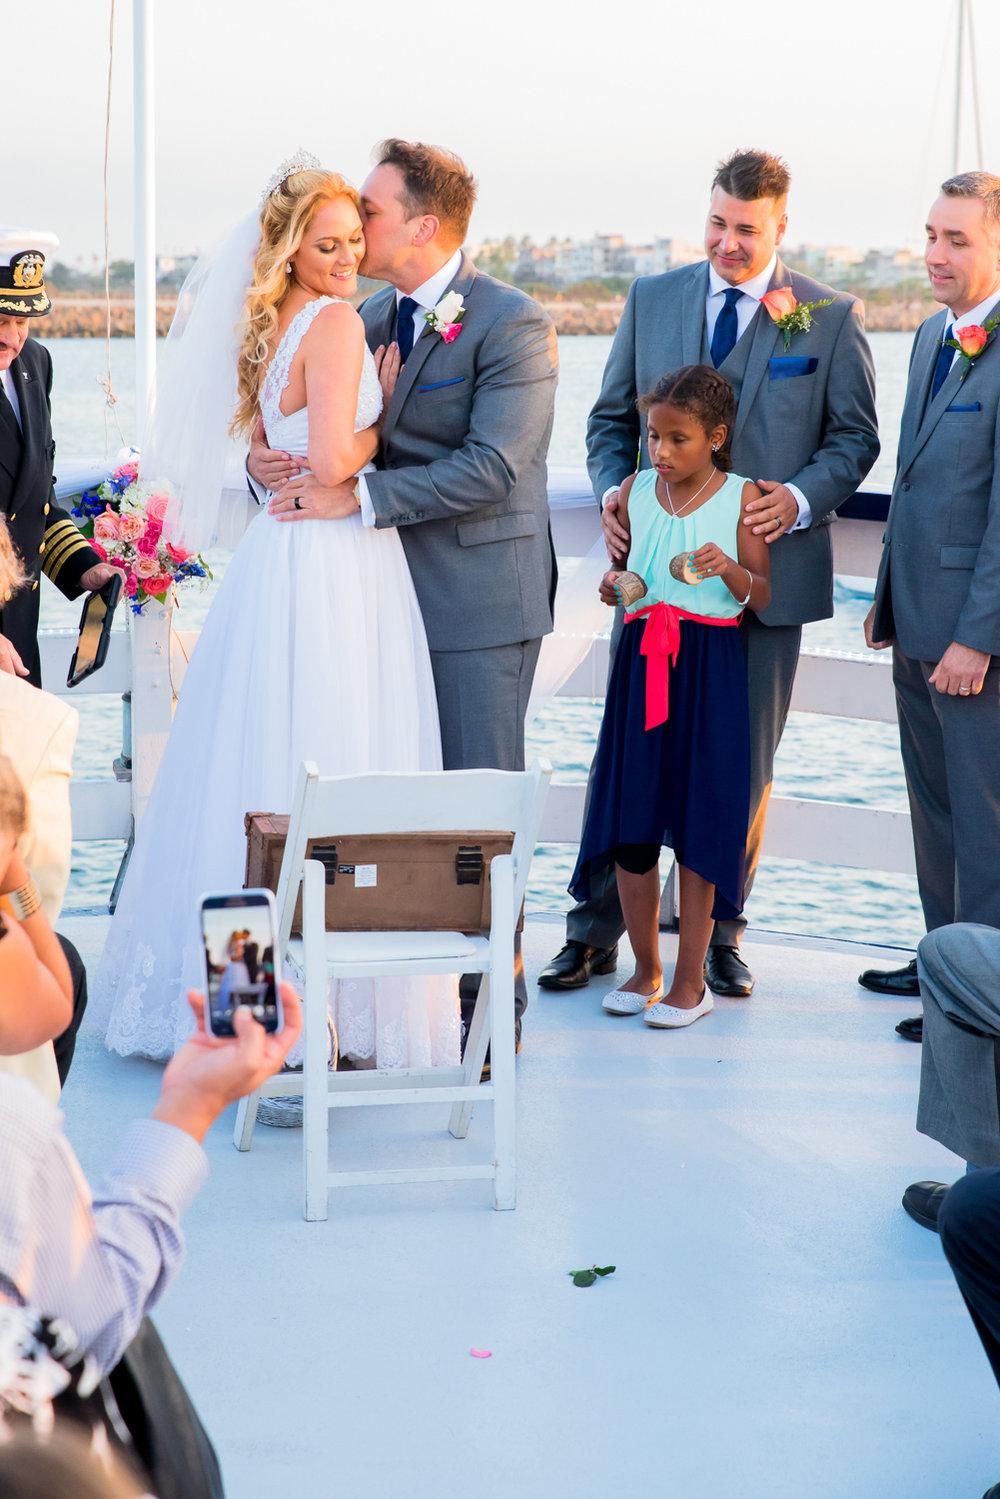 2016_September_04-nomad_lola_wedding_secondshooter-27484.jpg